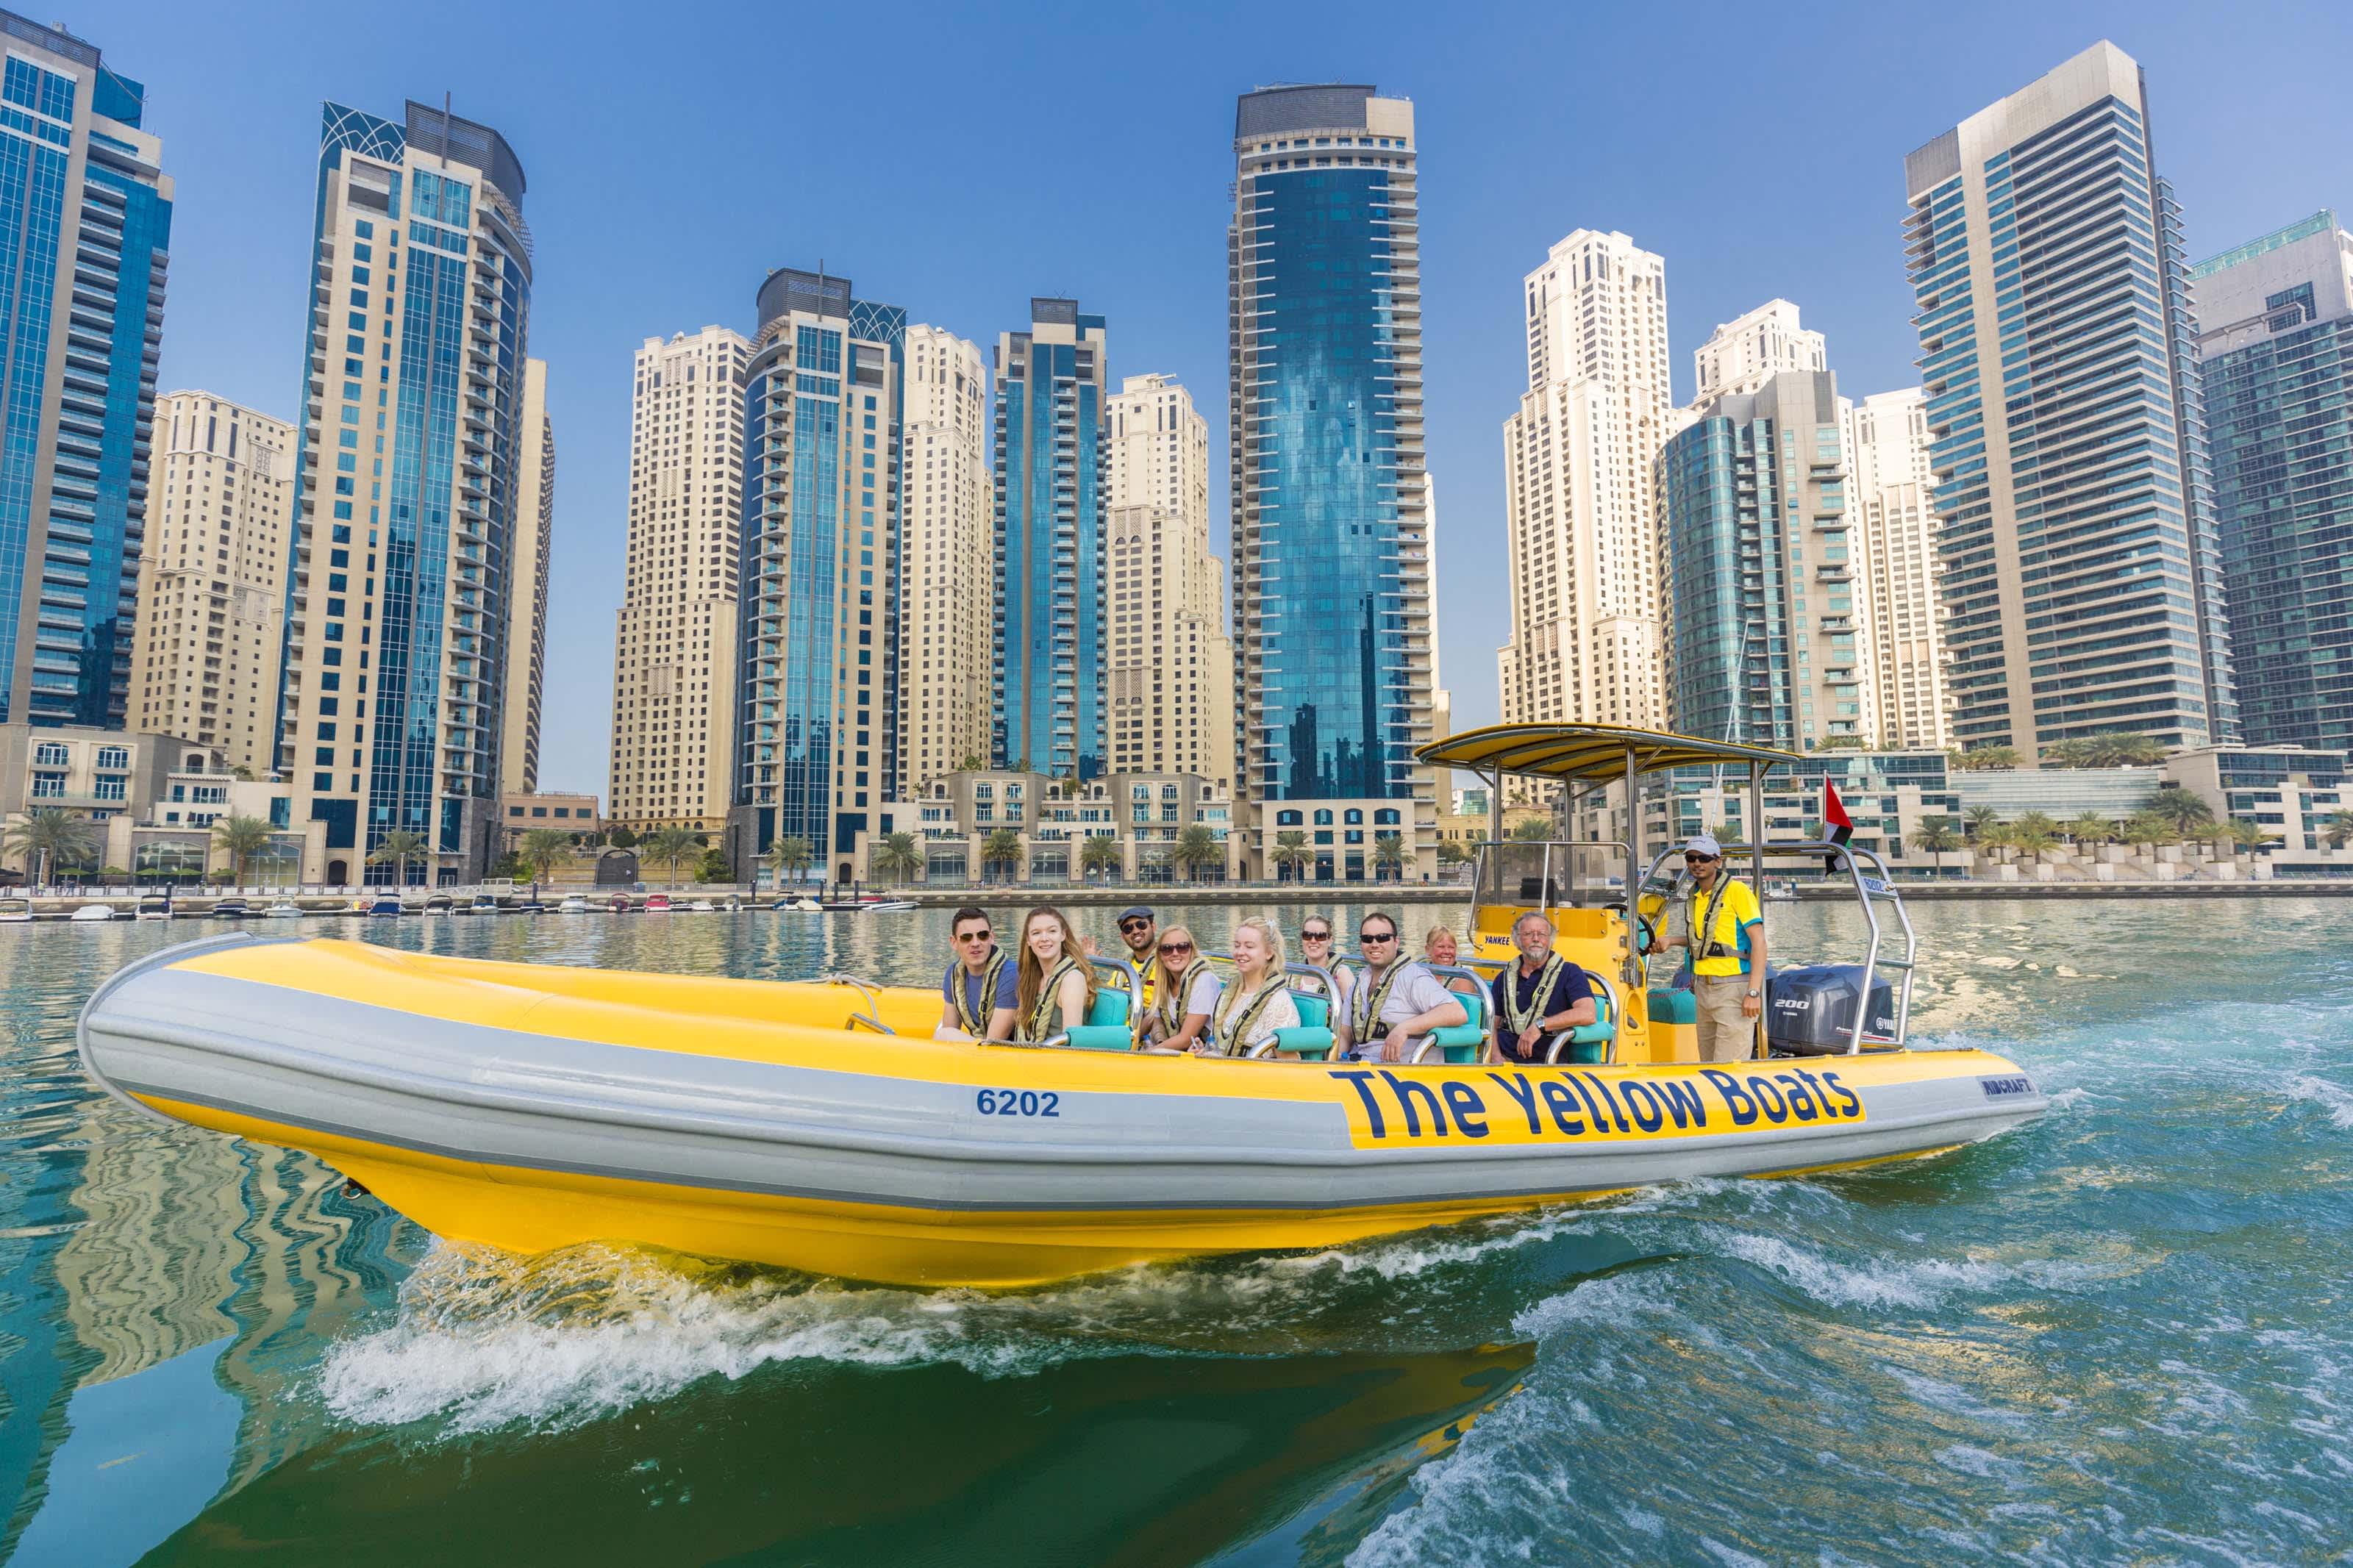 The Yellow Boats Dubai Tours